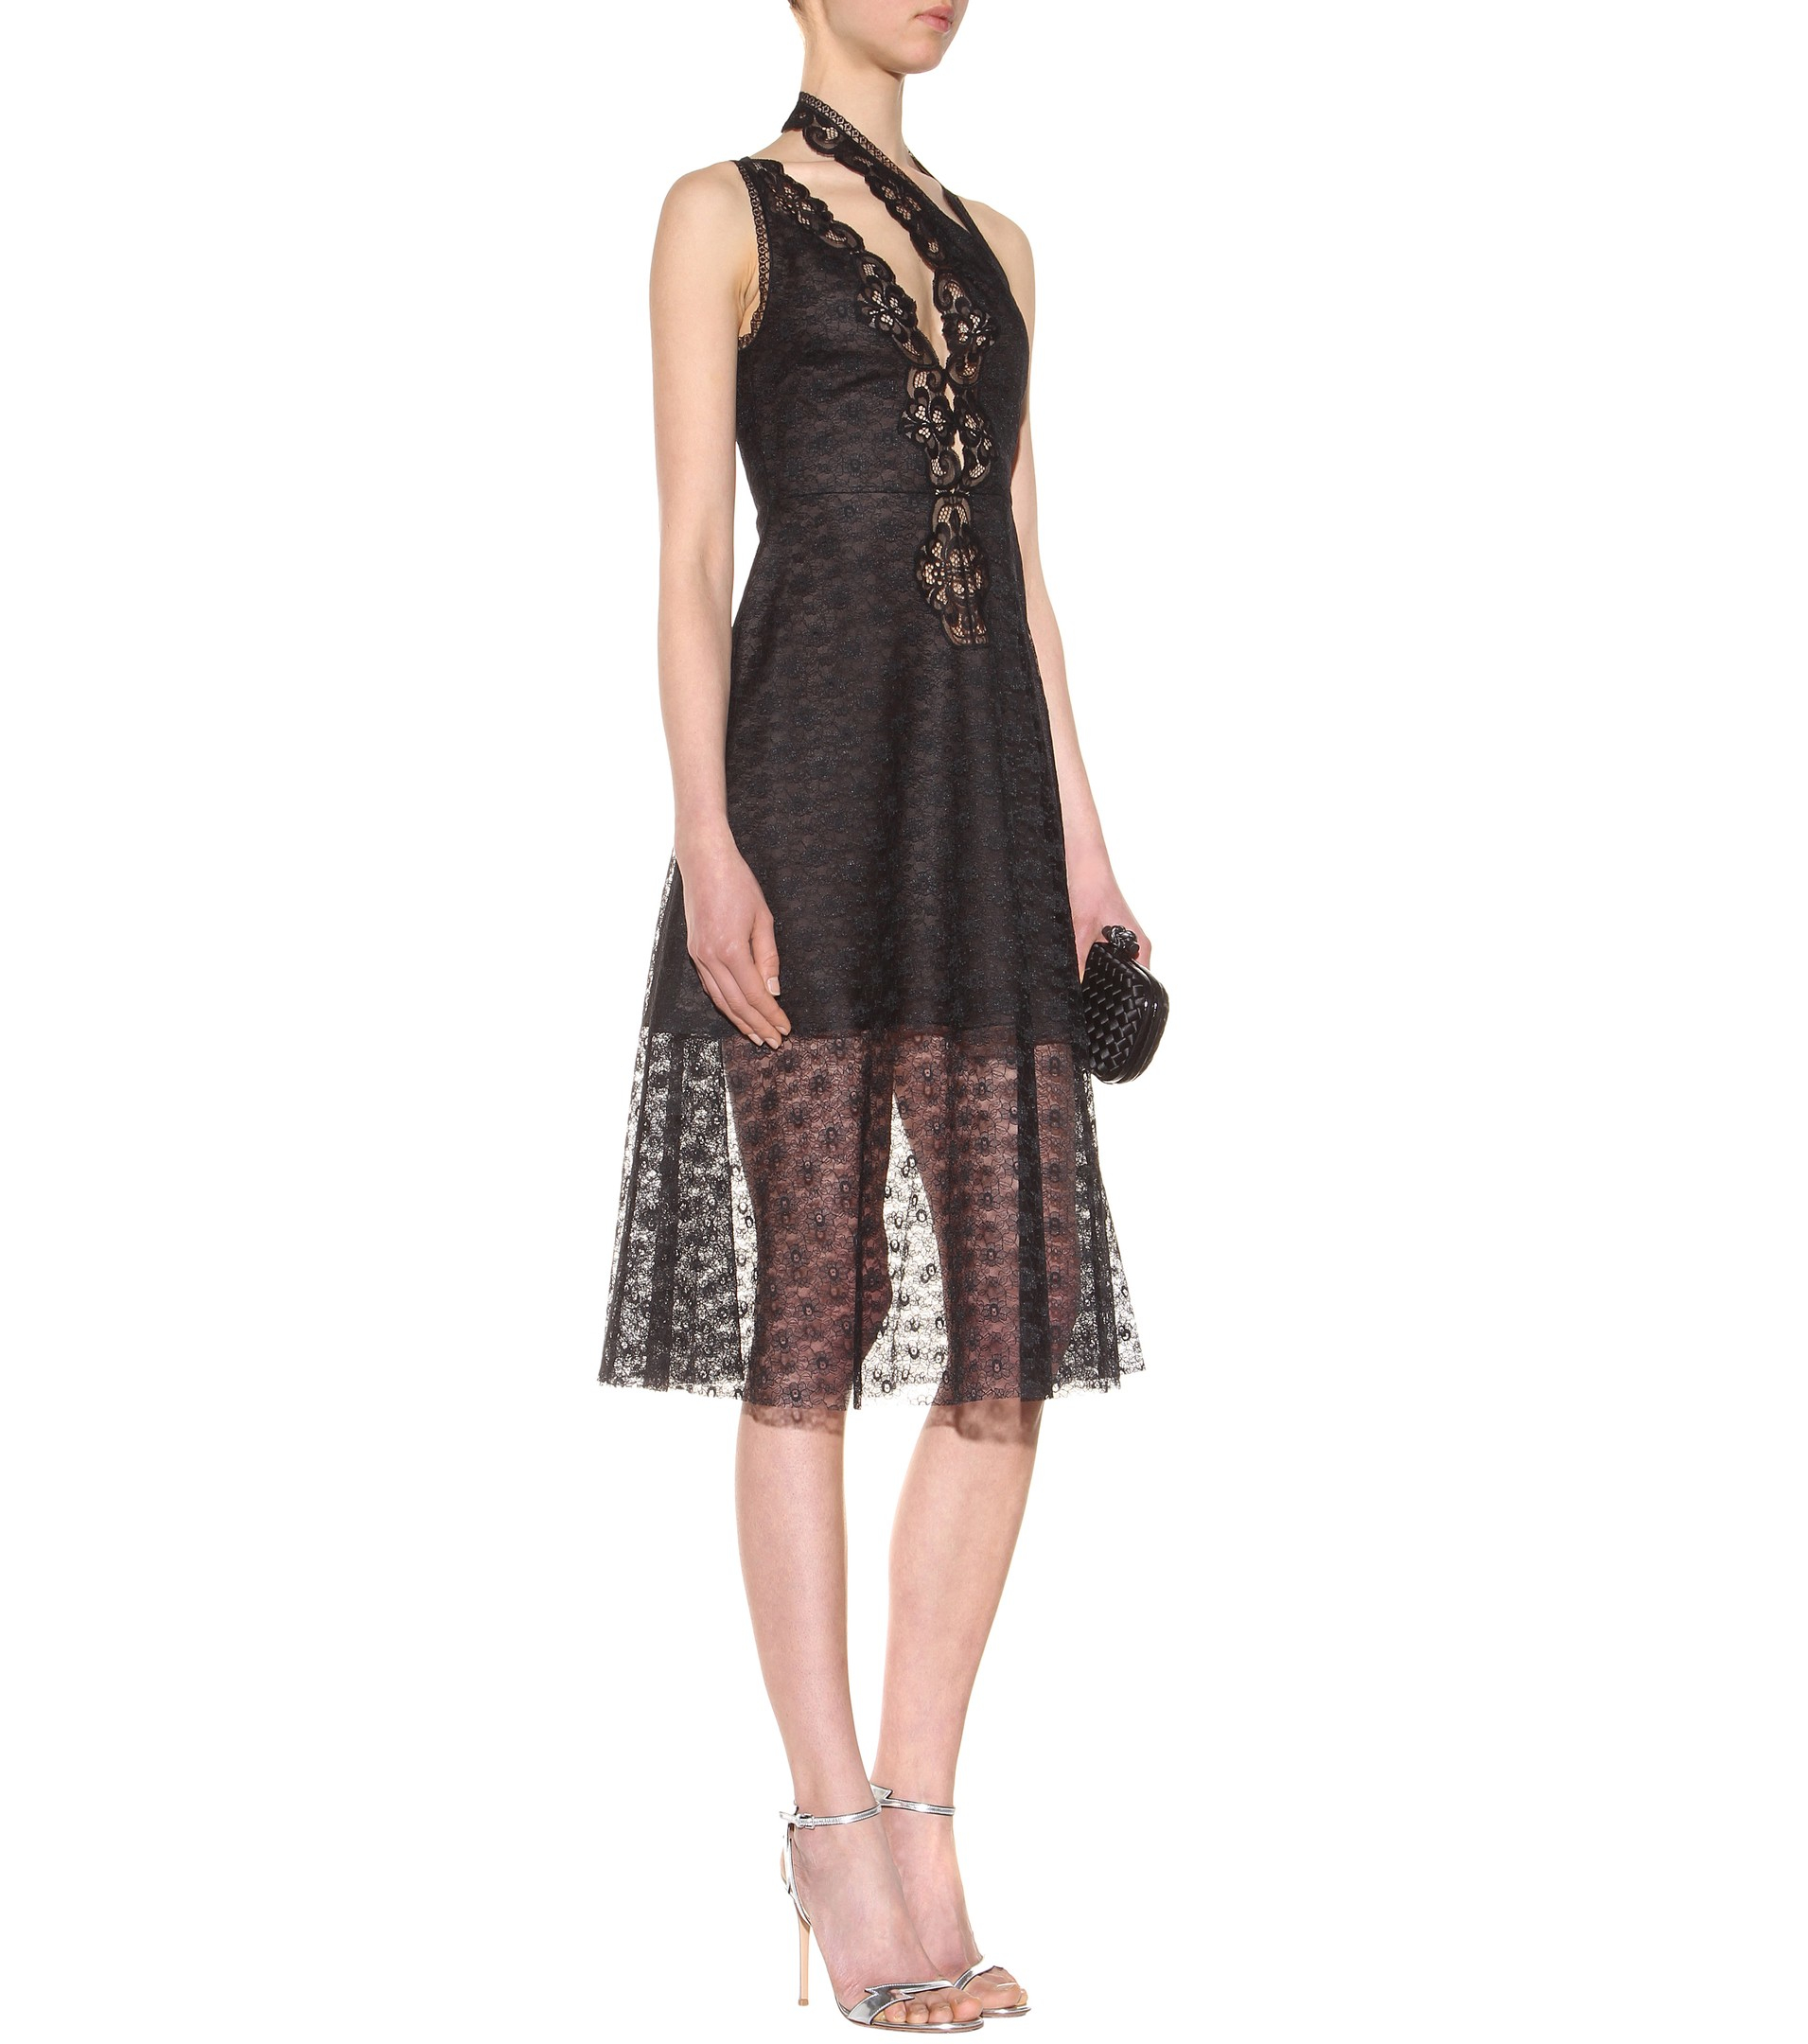 Stella Mccartney Woman Picot-trimmed Embroidered Cotton-blend Lace Midi Dress Red Size 40 Stella McCartney Top Quality Online BbVVshx0